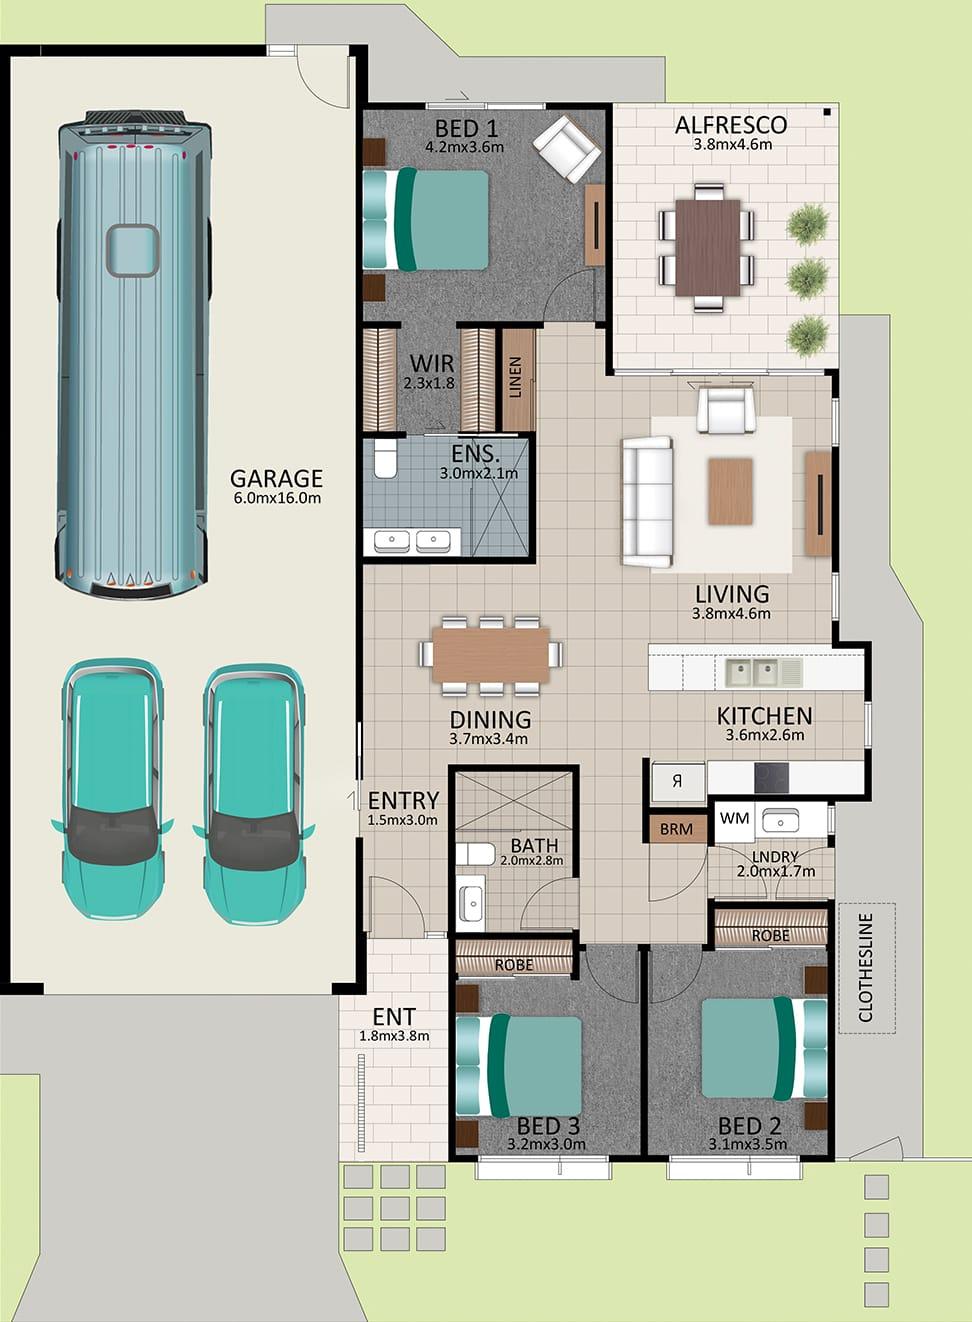 LR WEB LAT25 Floorplan LOT 184 Watson NOV19 V1 - Lot 184